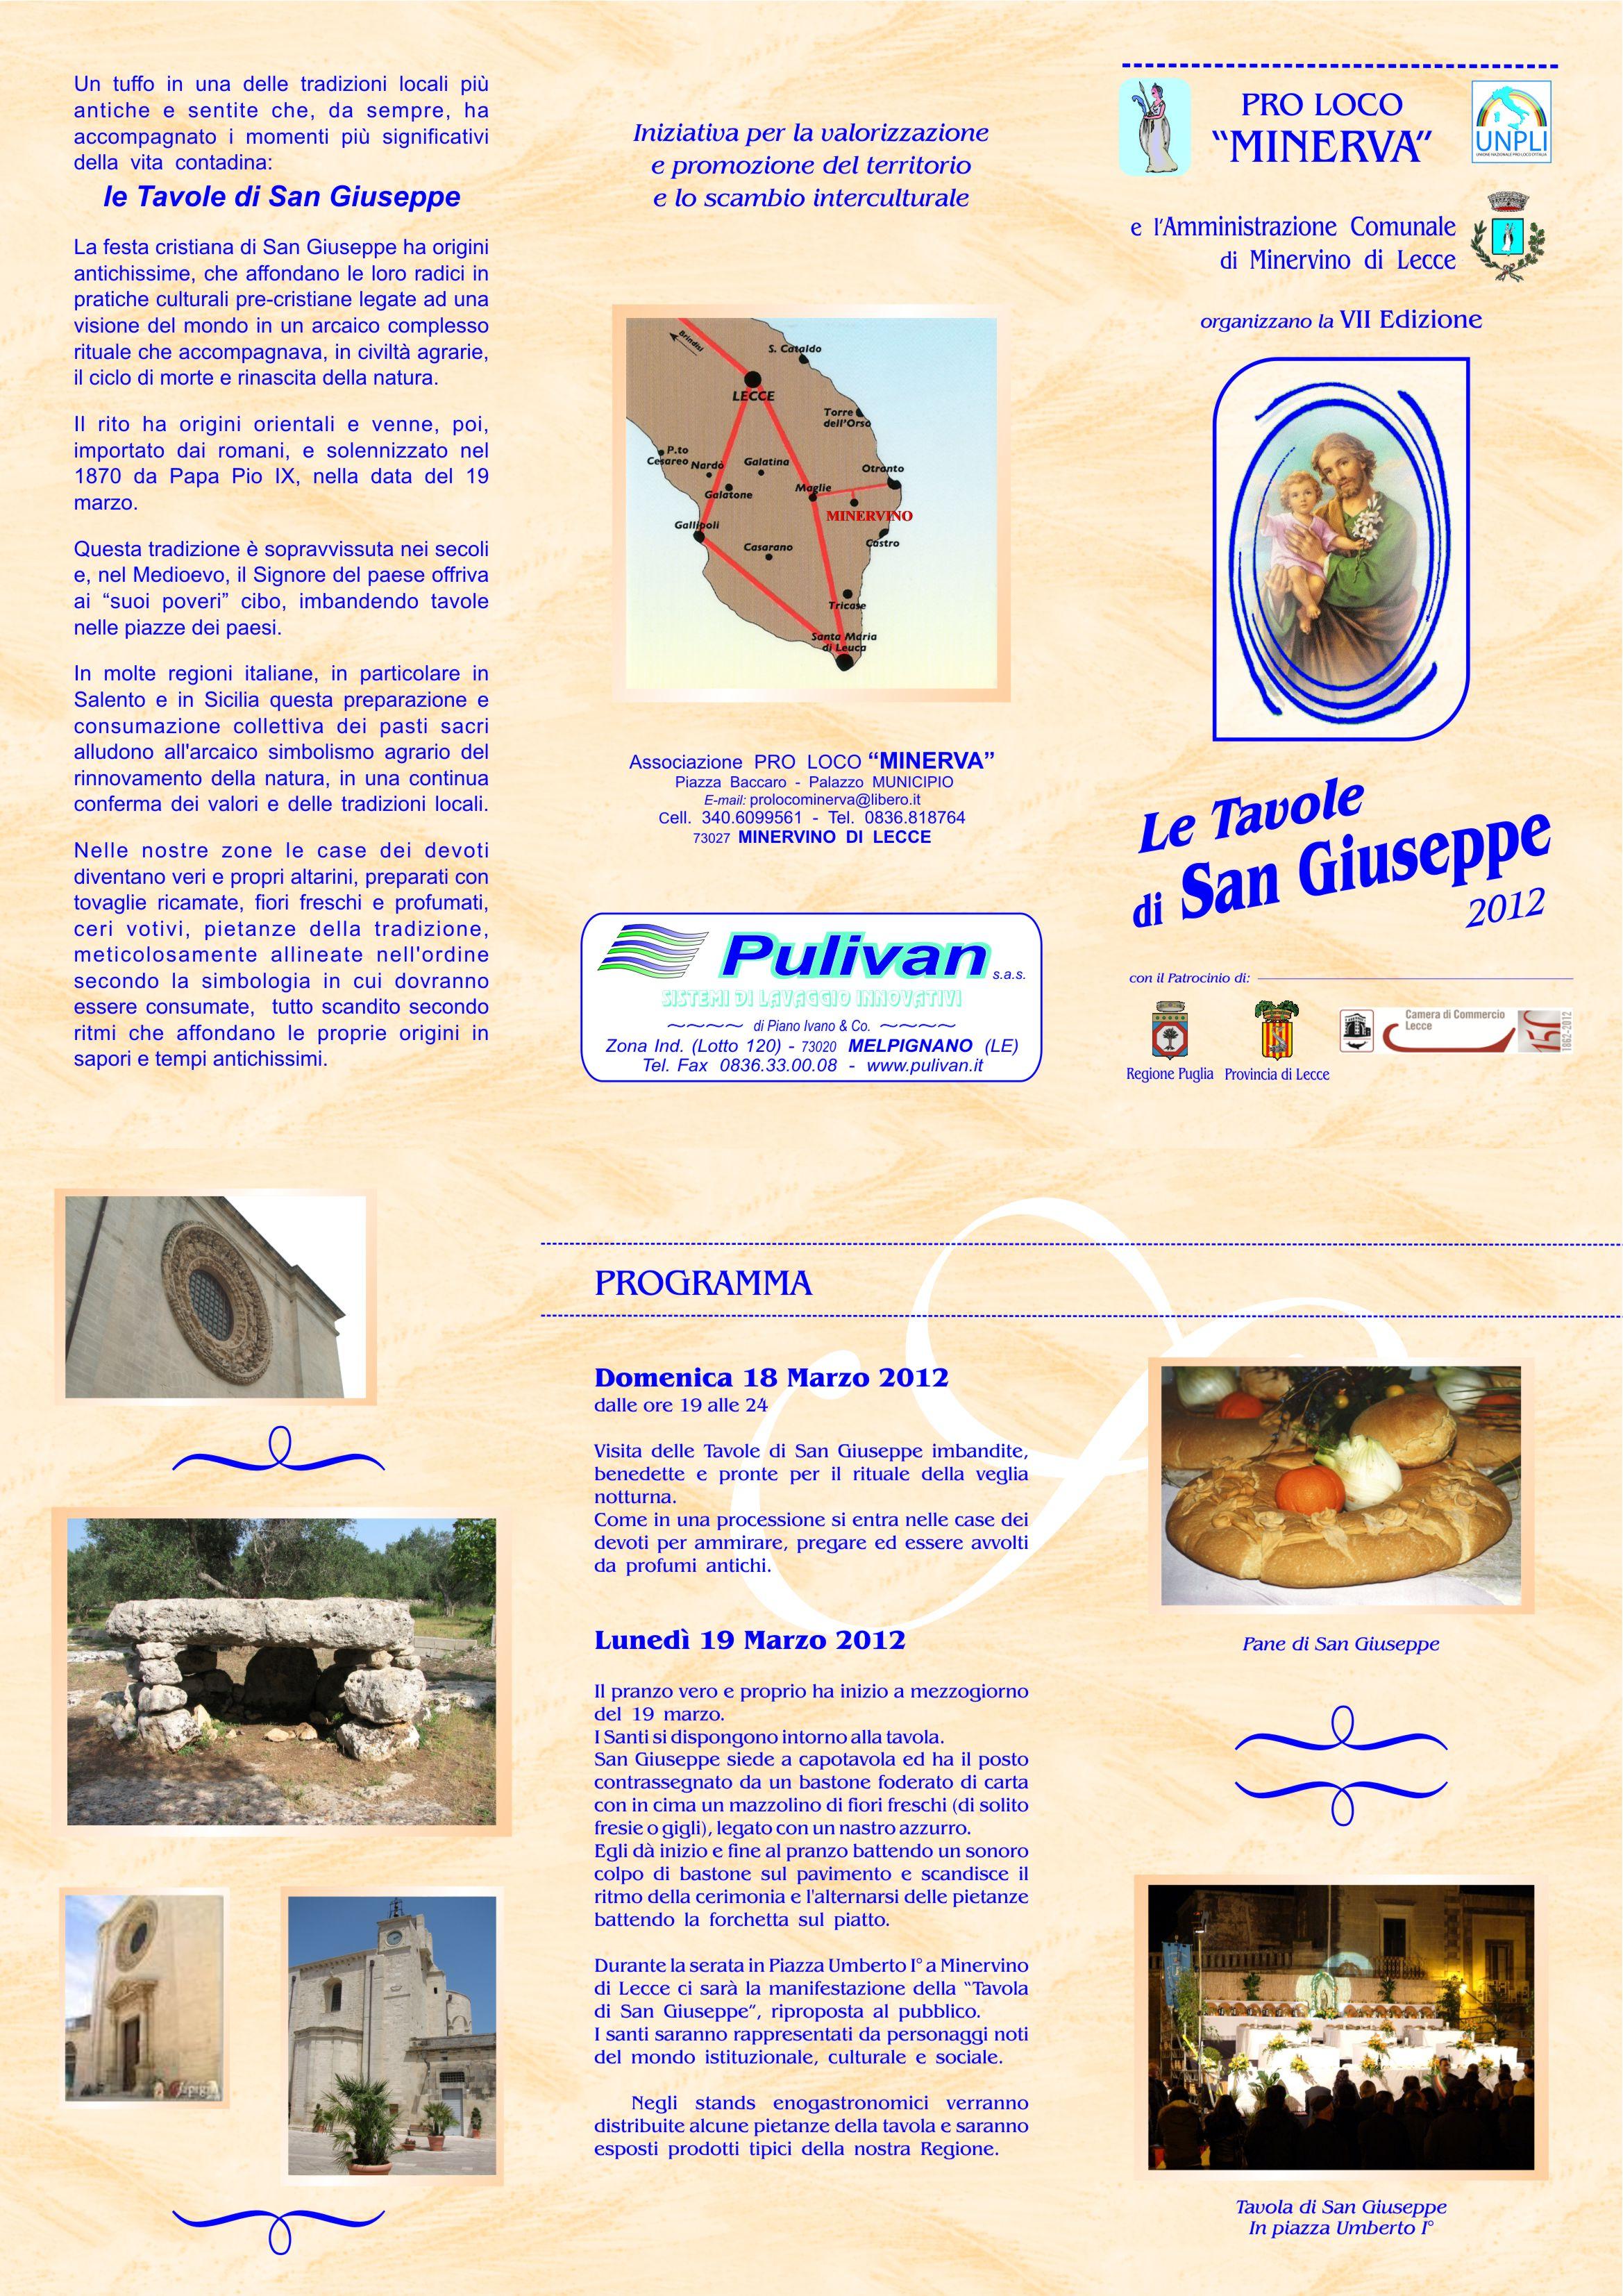 proloco-minerva-tavola-s-giuseppe-2012